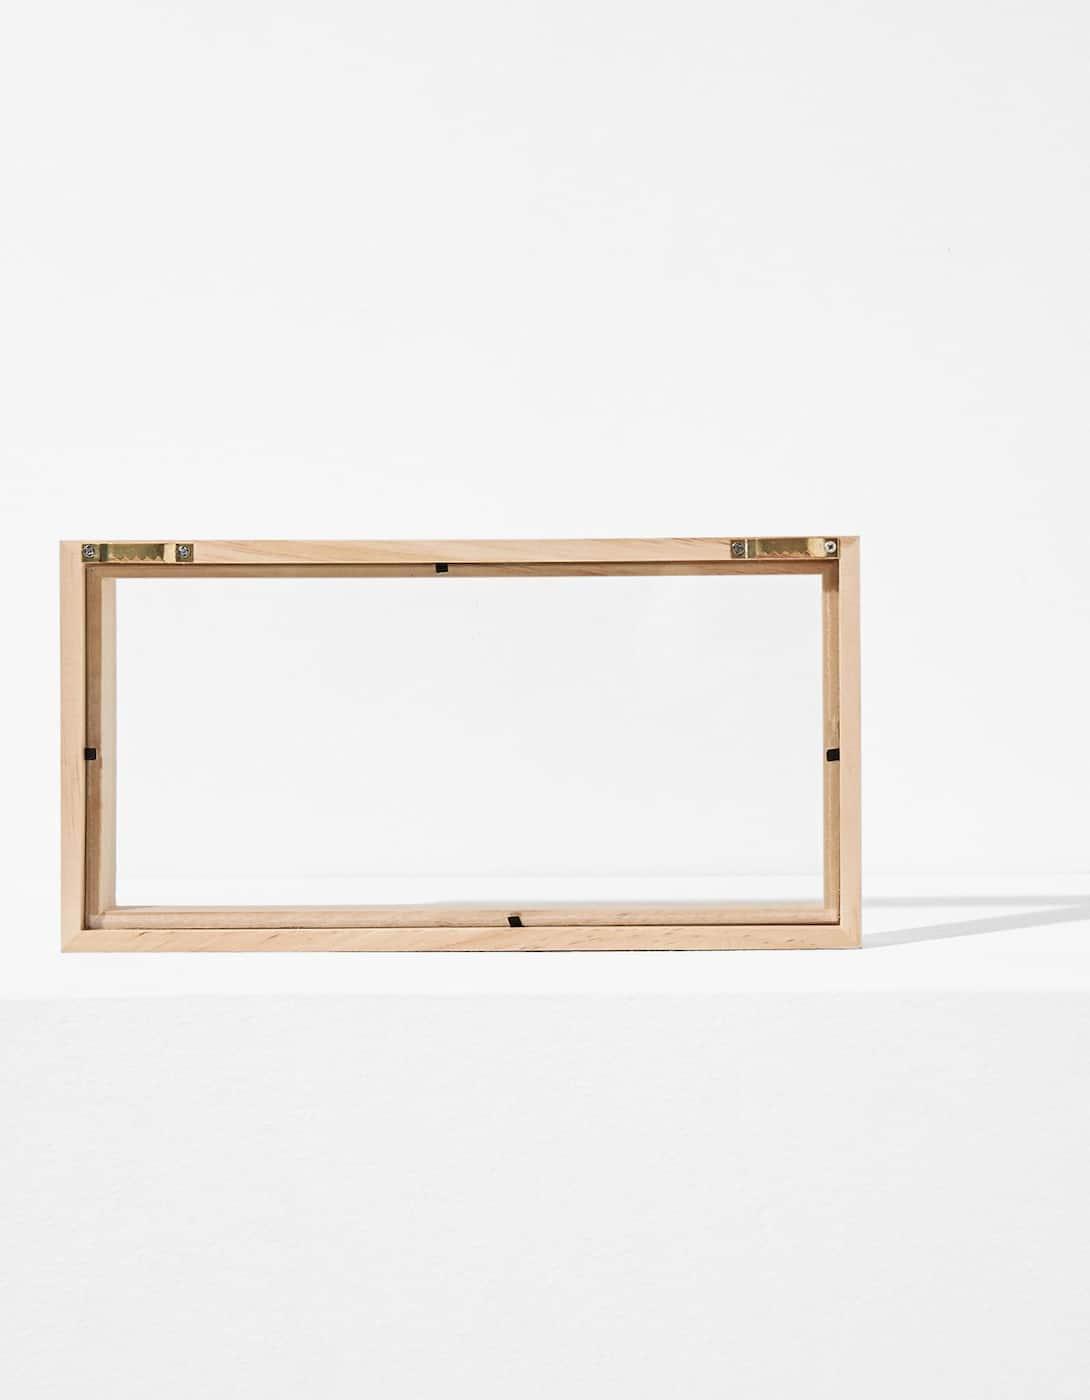 Bilderrahmen im Minimal-Design - Fotorahmen | Stradivarius ...